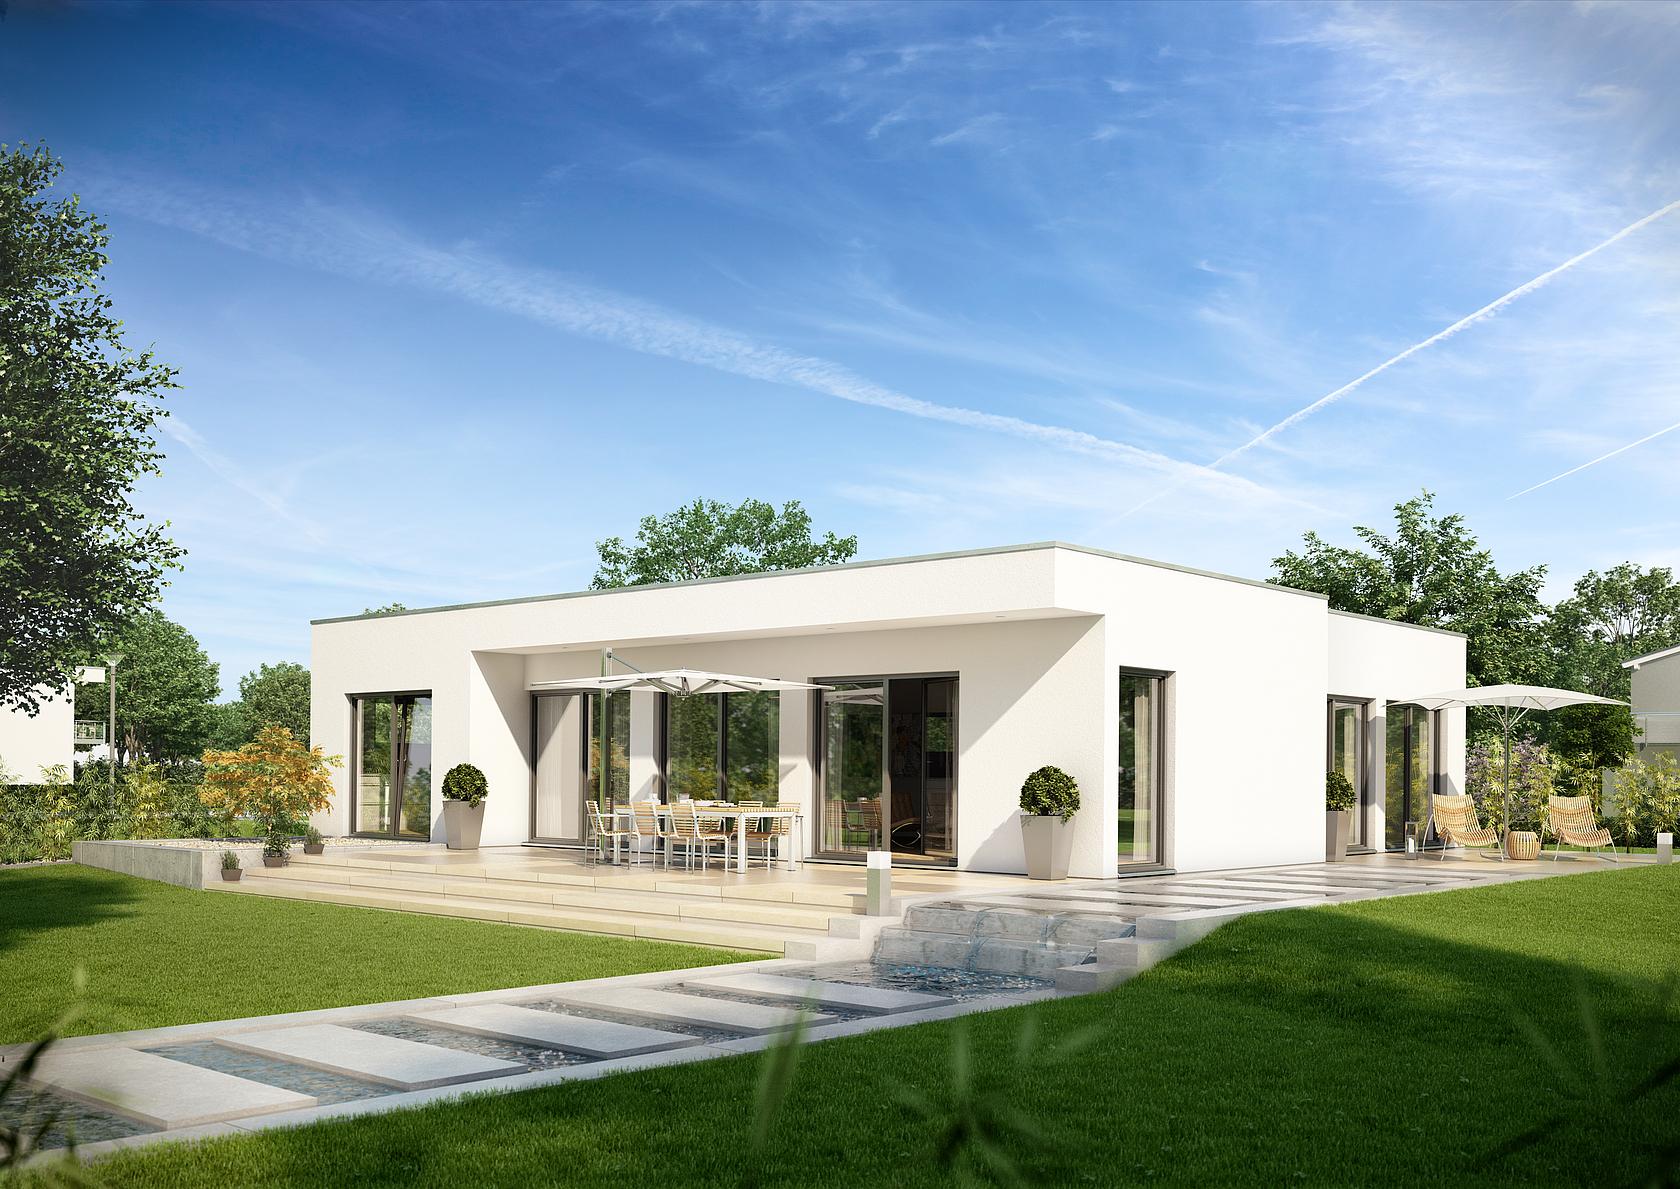 Bungalow purea im bauhausstil kern haus for Flachdach bungalow modern